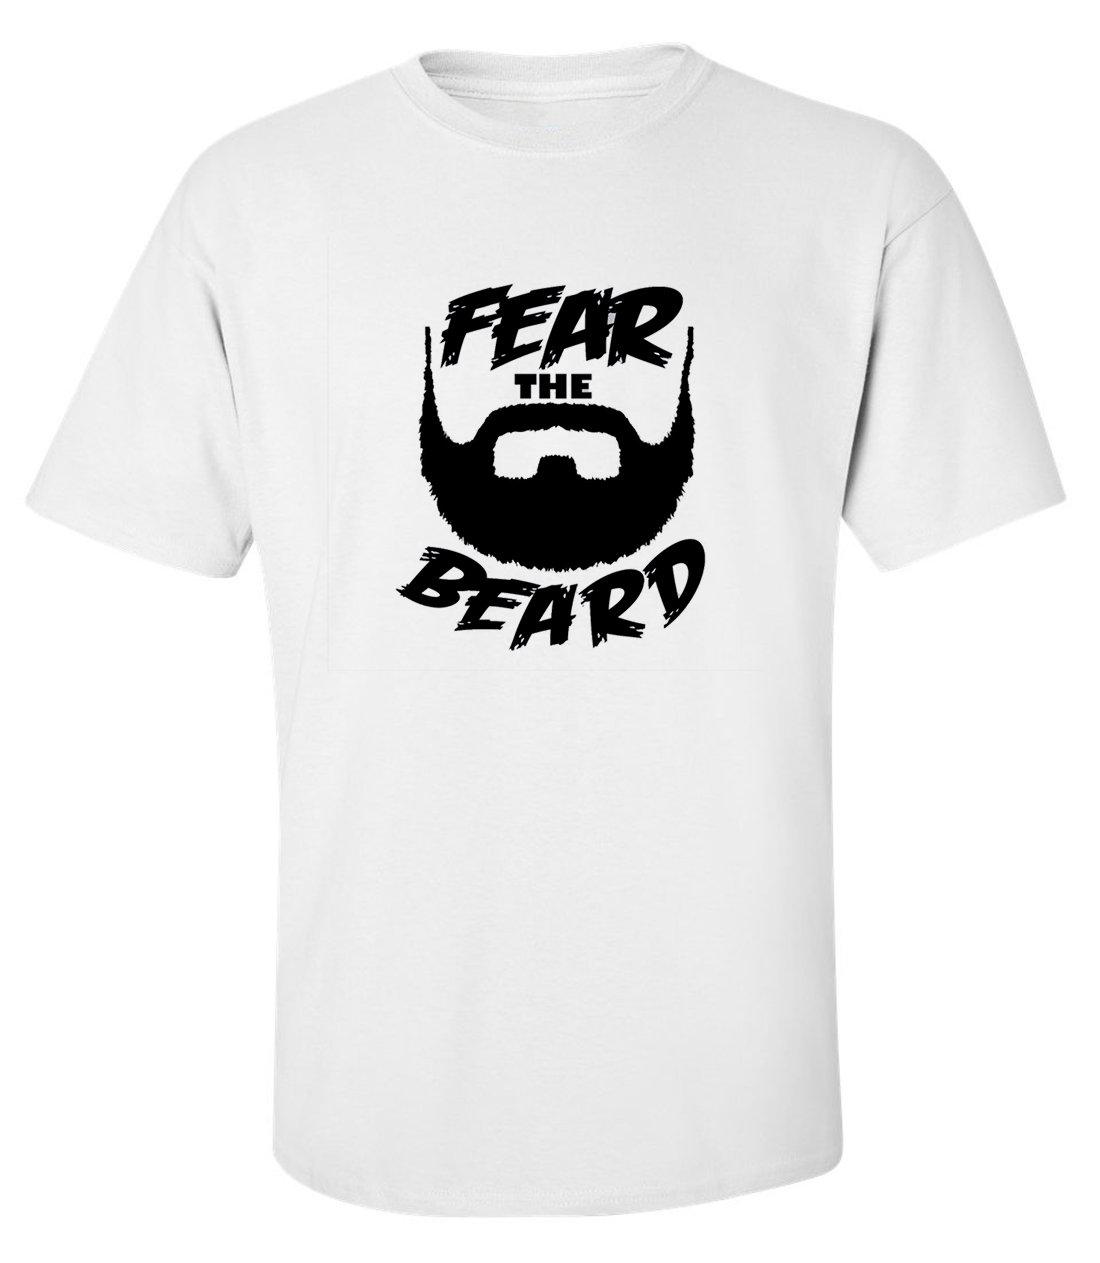 Fear the beard funny slogan men printed cotton white t-shirt size 2XL